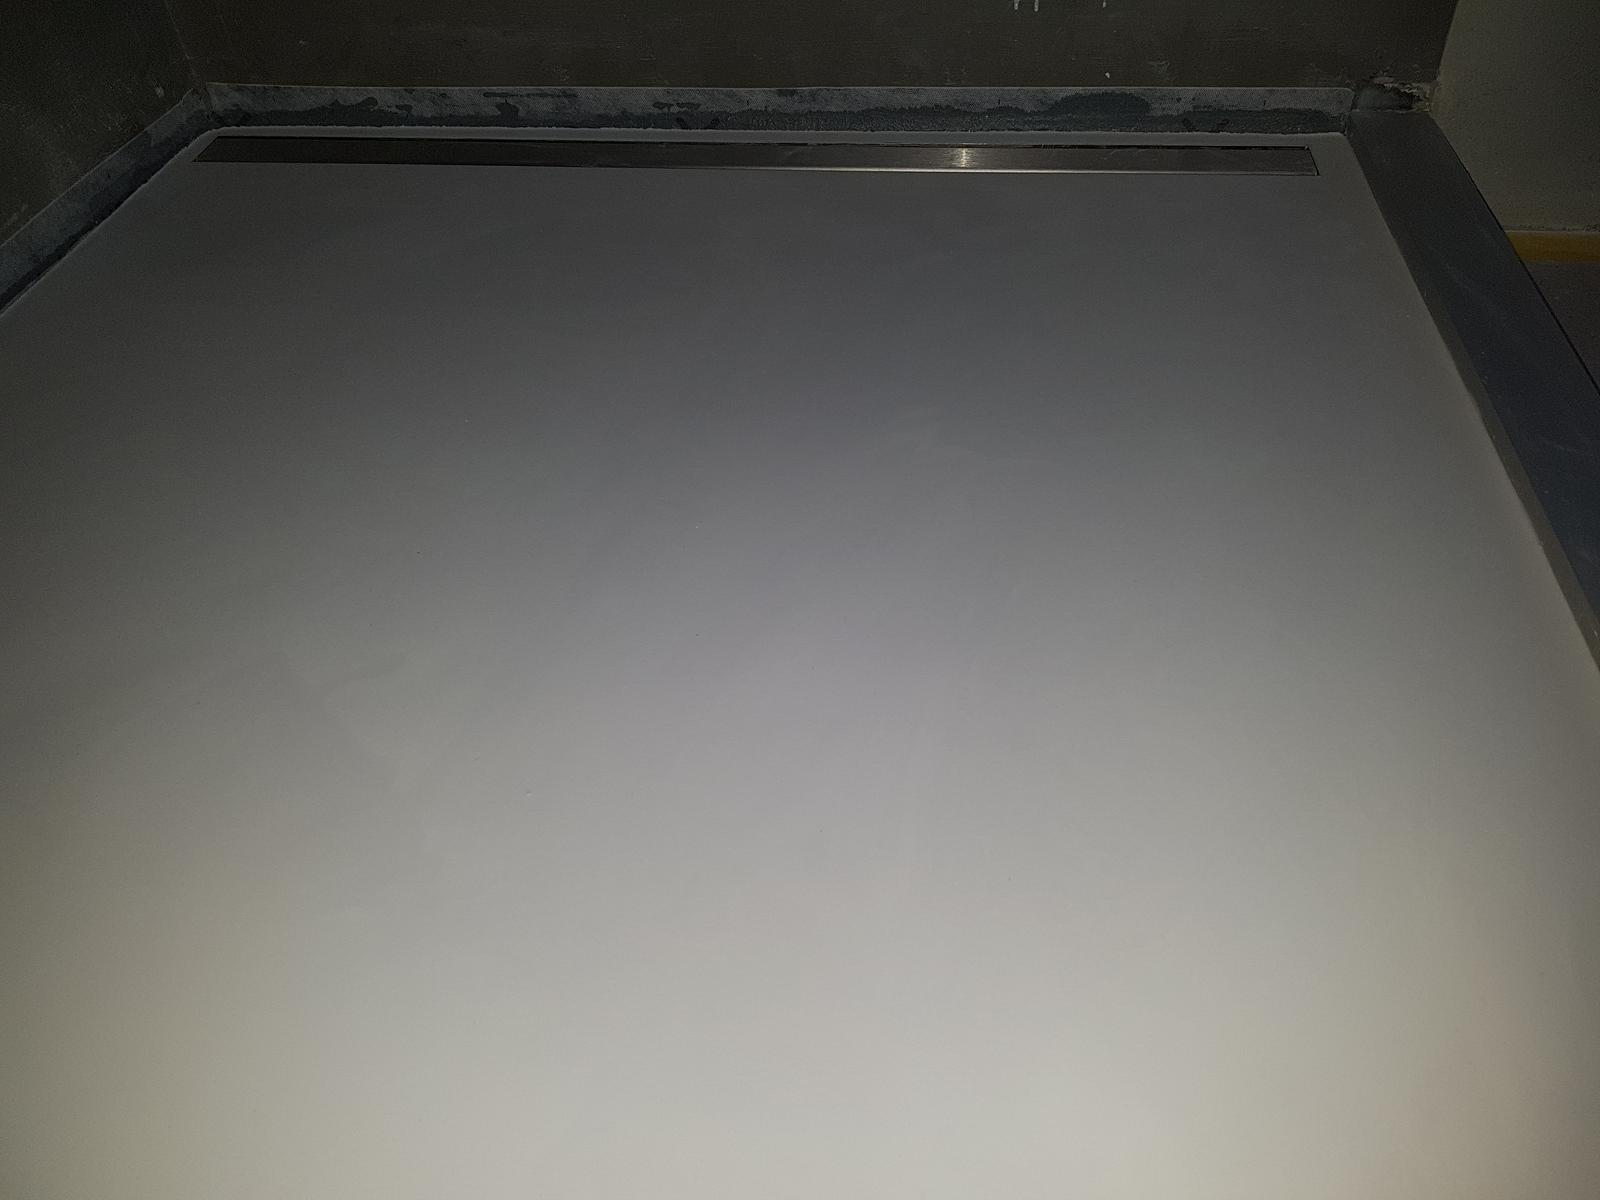 Liata podlaha - Obrázok č. 2